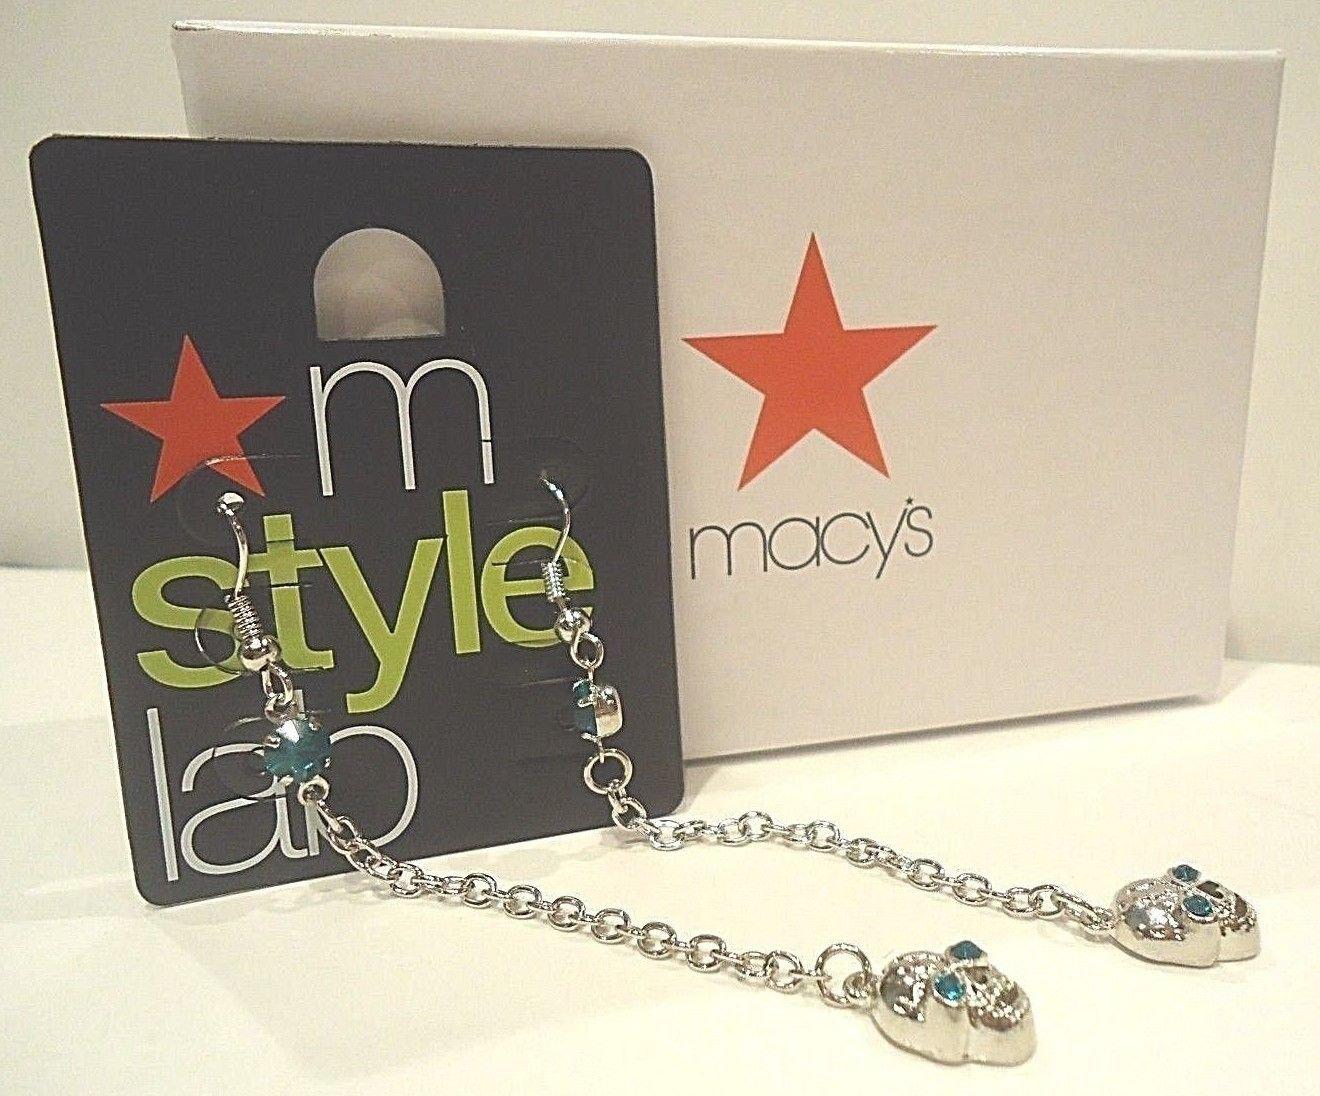 MACY'S - M STYLE LAB - BLUE - SILVER - SKULL - FASHION - EARRINGS - NEW - NWT